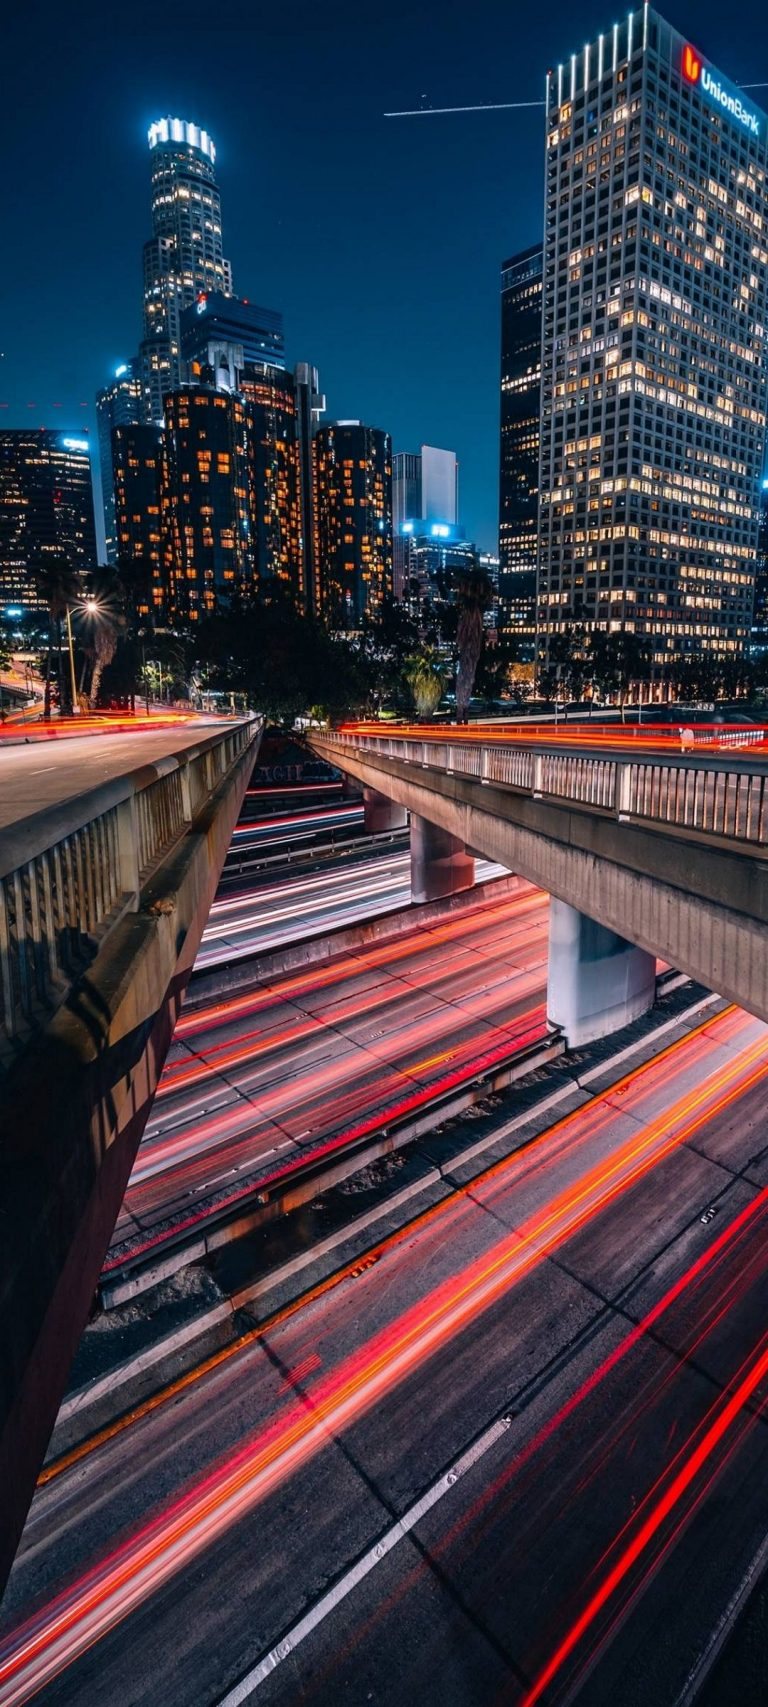 City Metropolis Los Angeles 1080x2400 768x1707